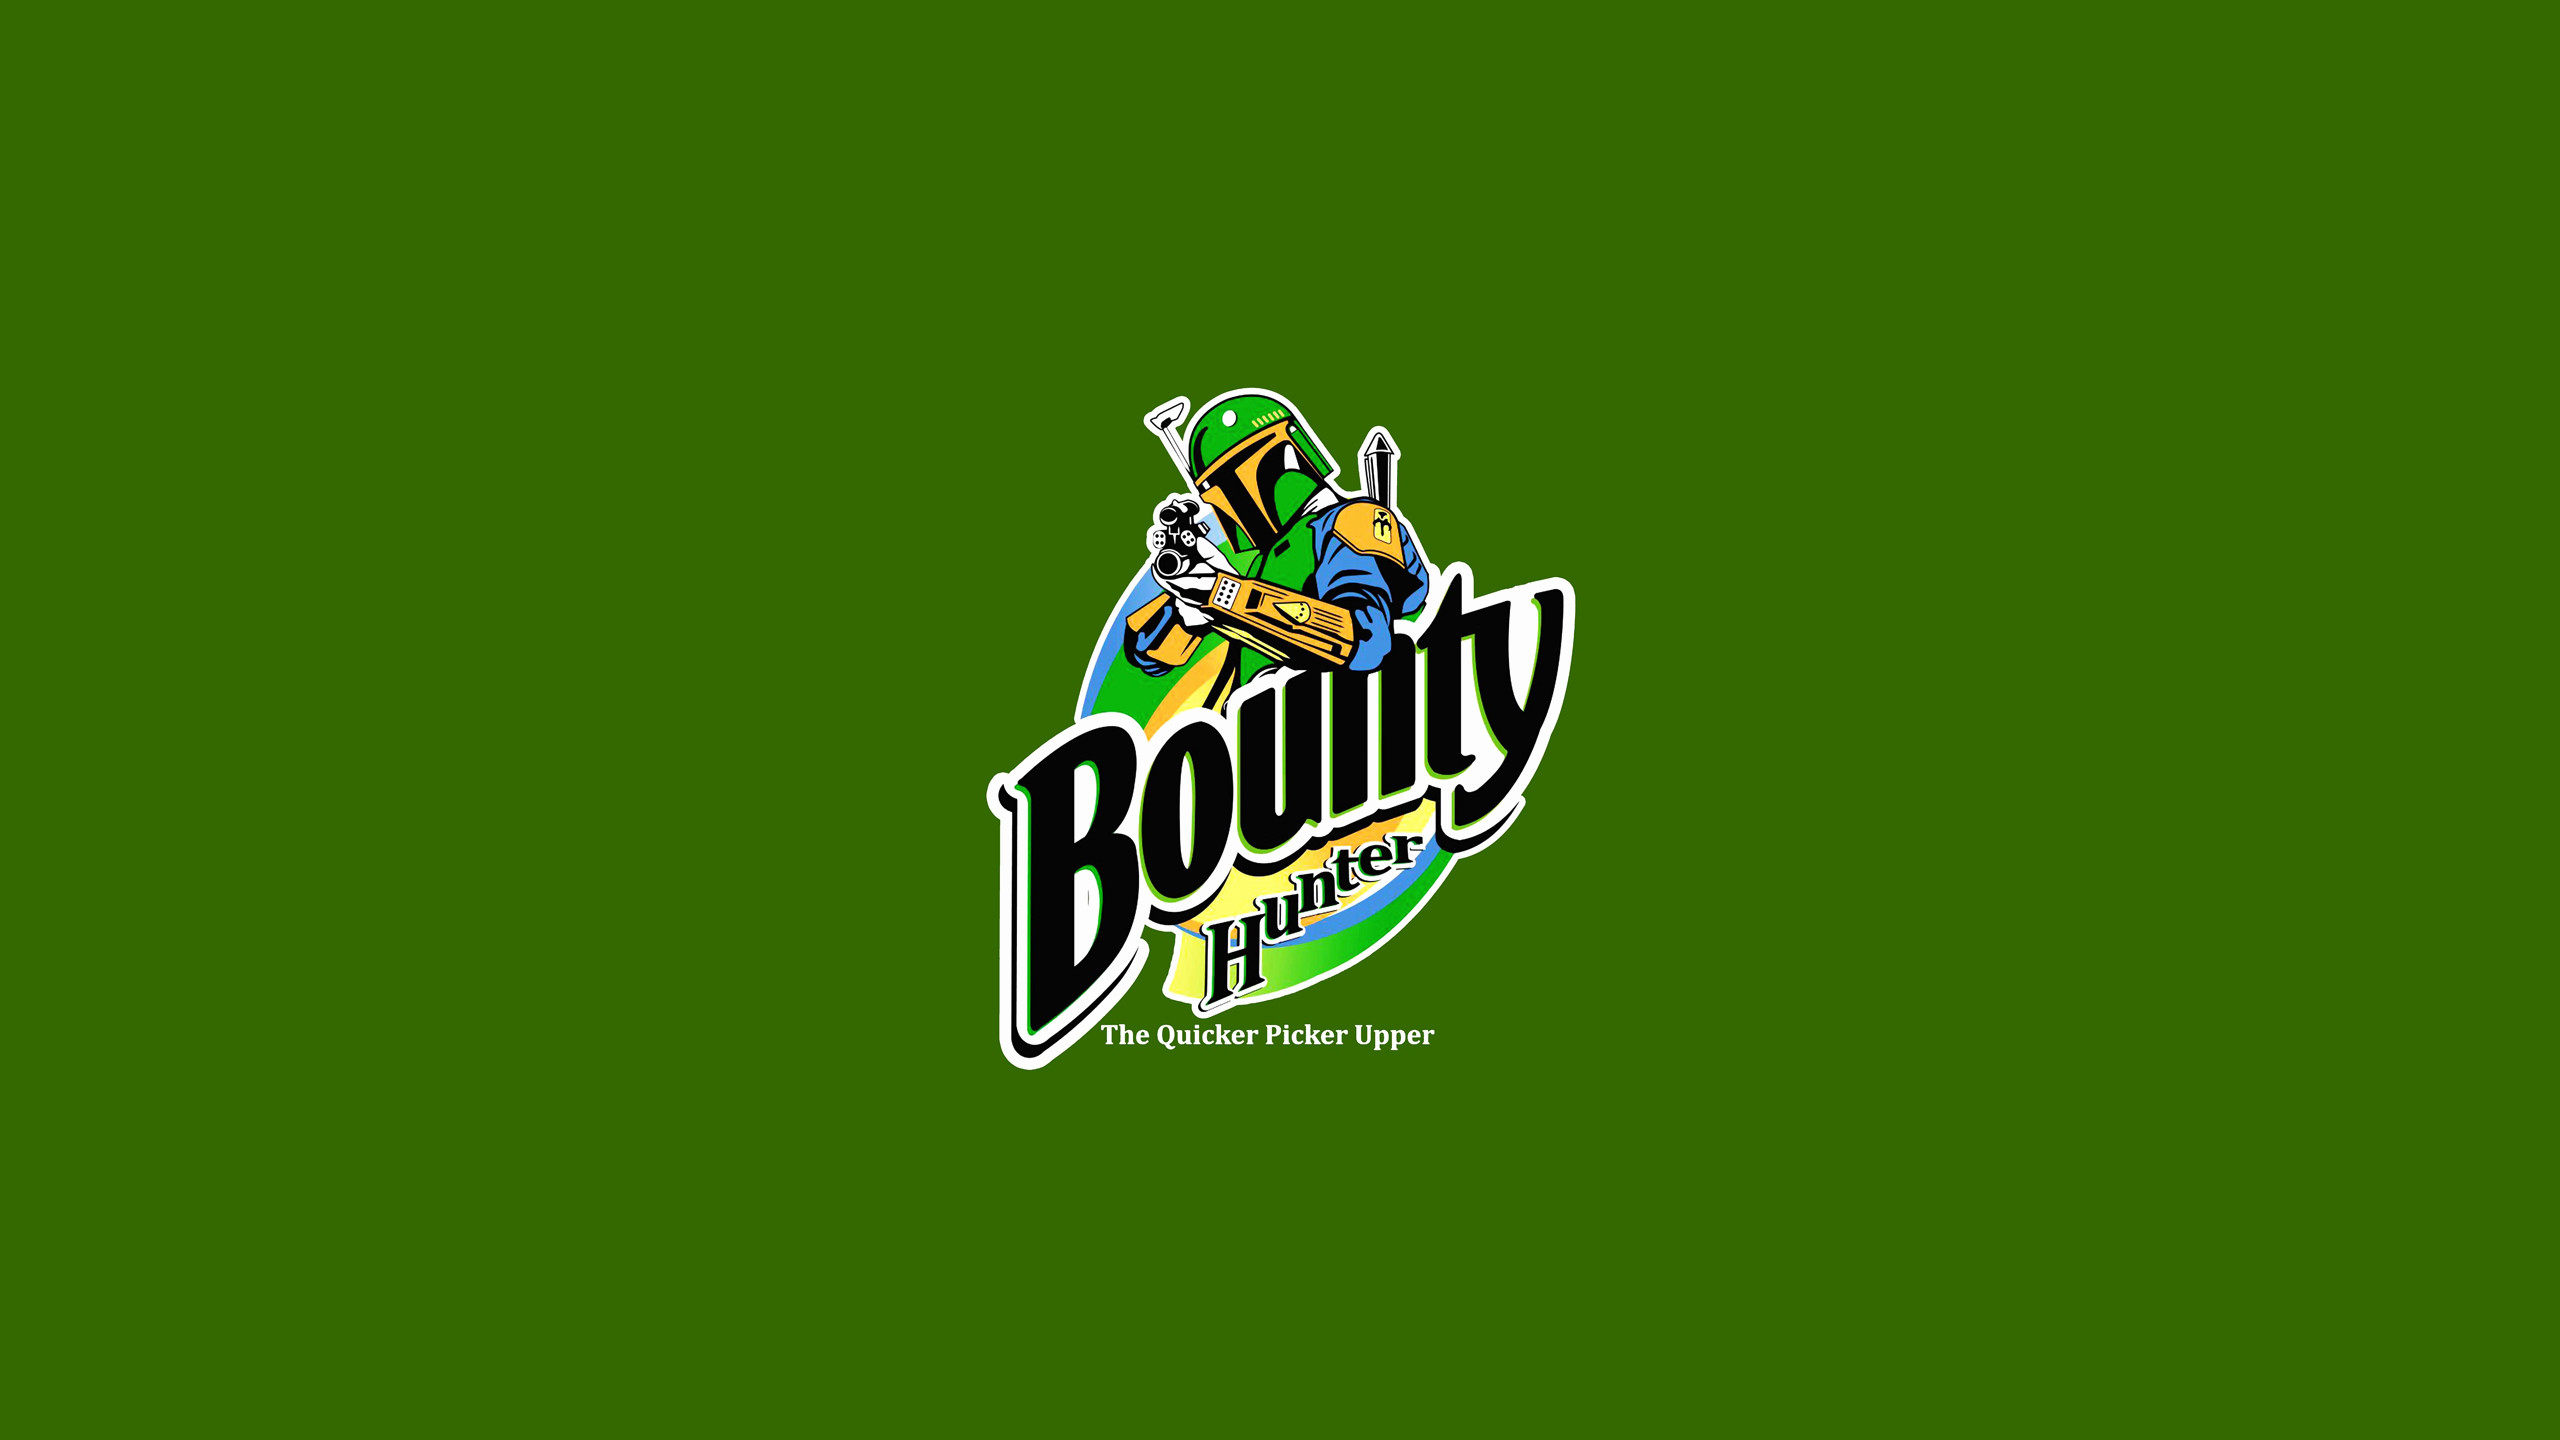 Res: 2560x1440, Boba Fett Wallpaper Beautiful Star Wars Bounty Hunter Wallpapers Group 70